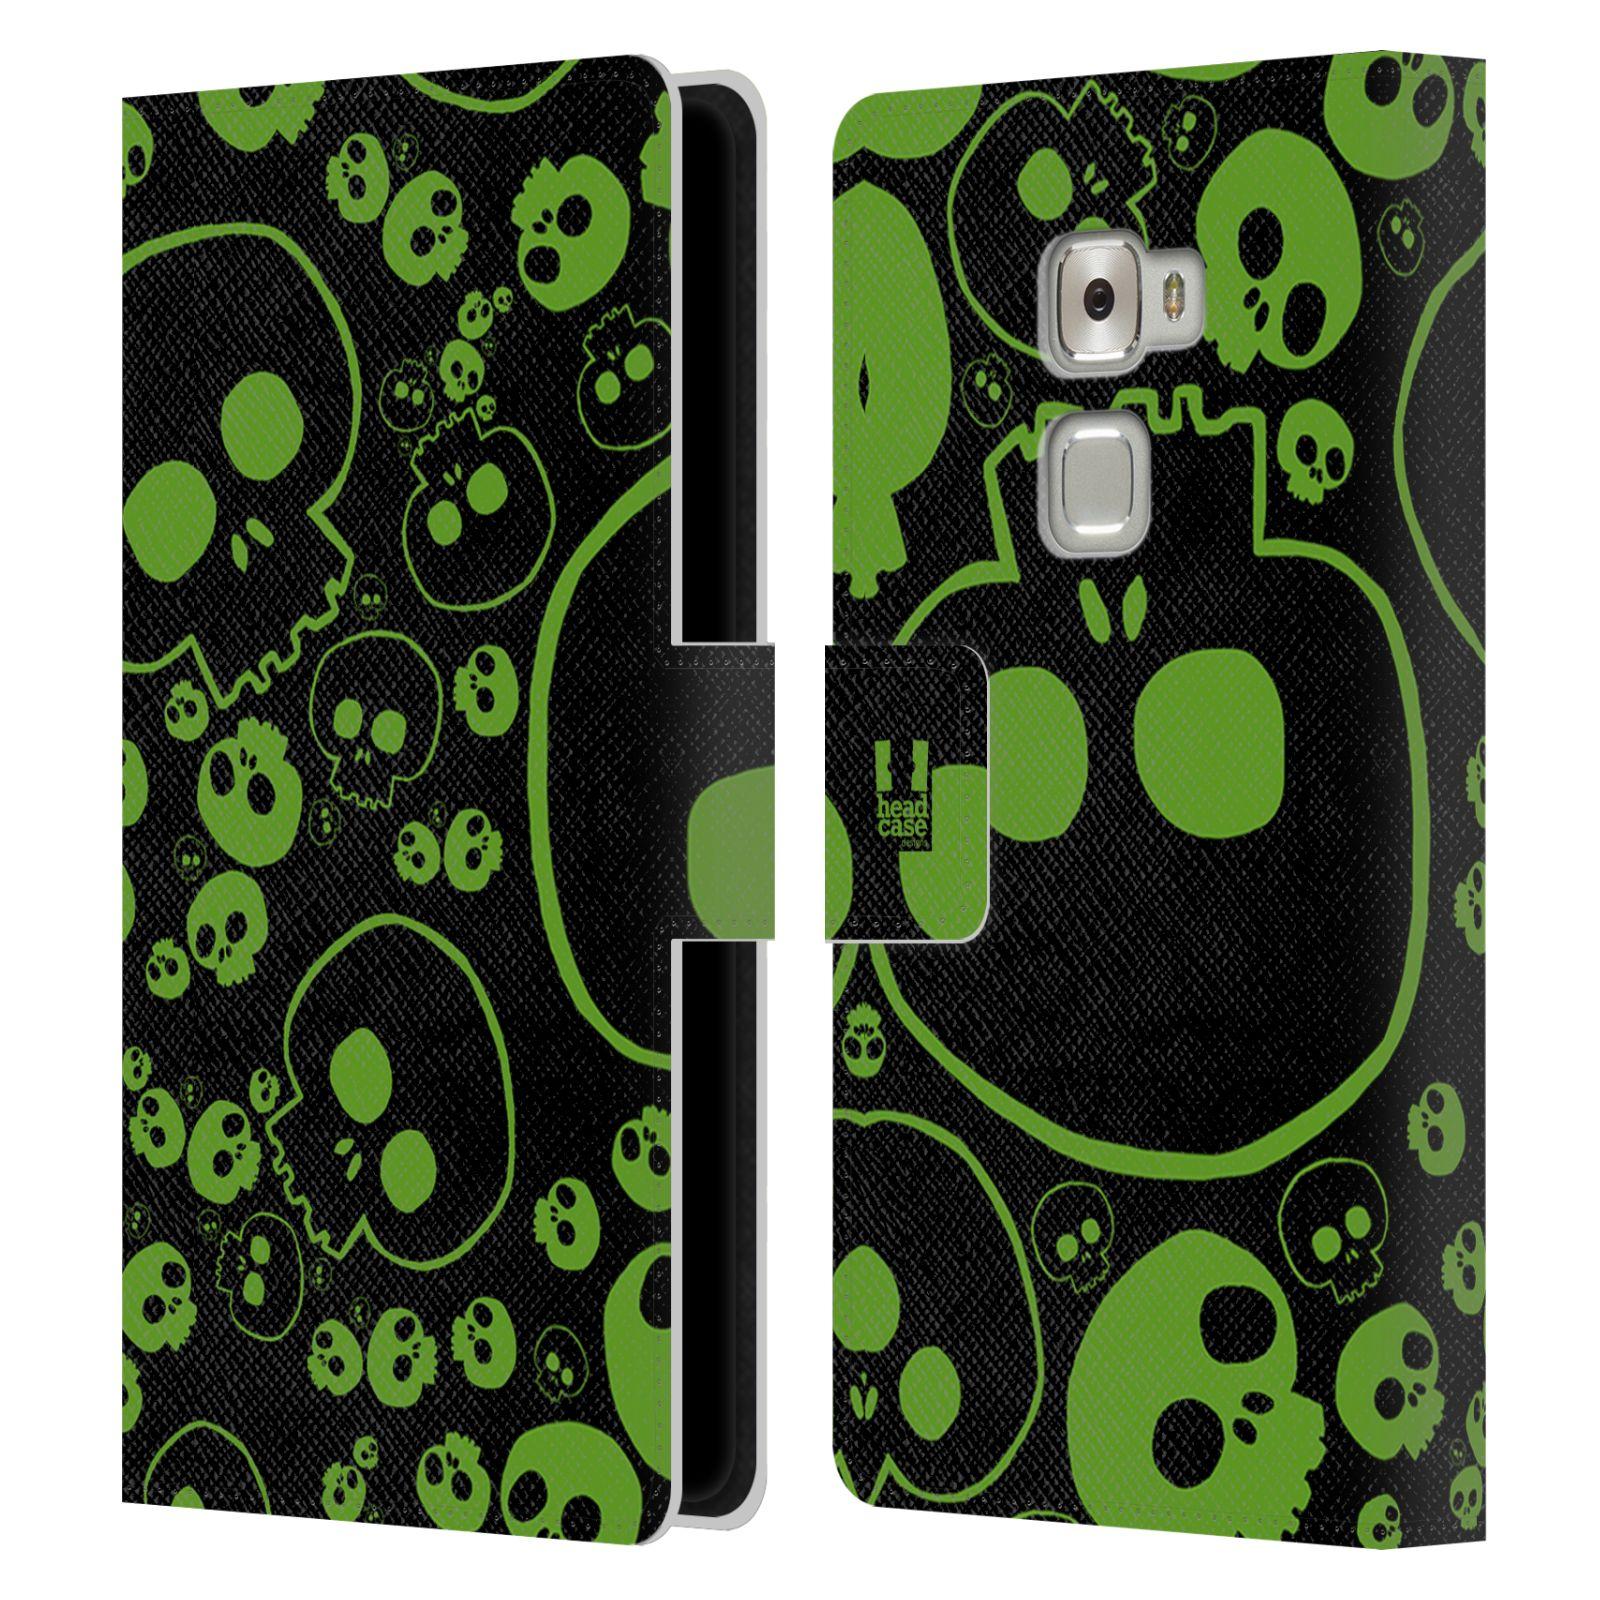 HEAD CASE Flipové pouzdro pro mobil Huawei MATE S barevné lebky zelená